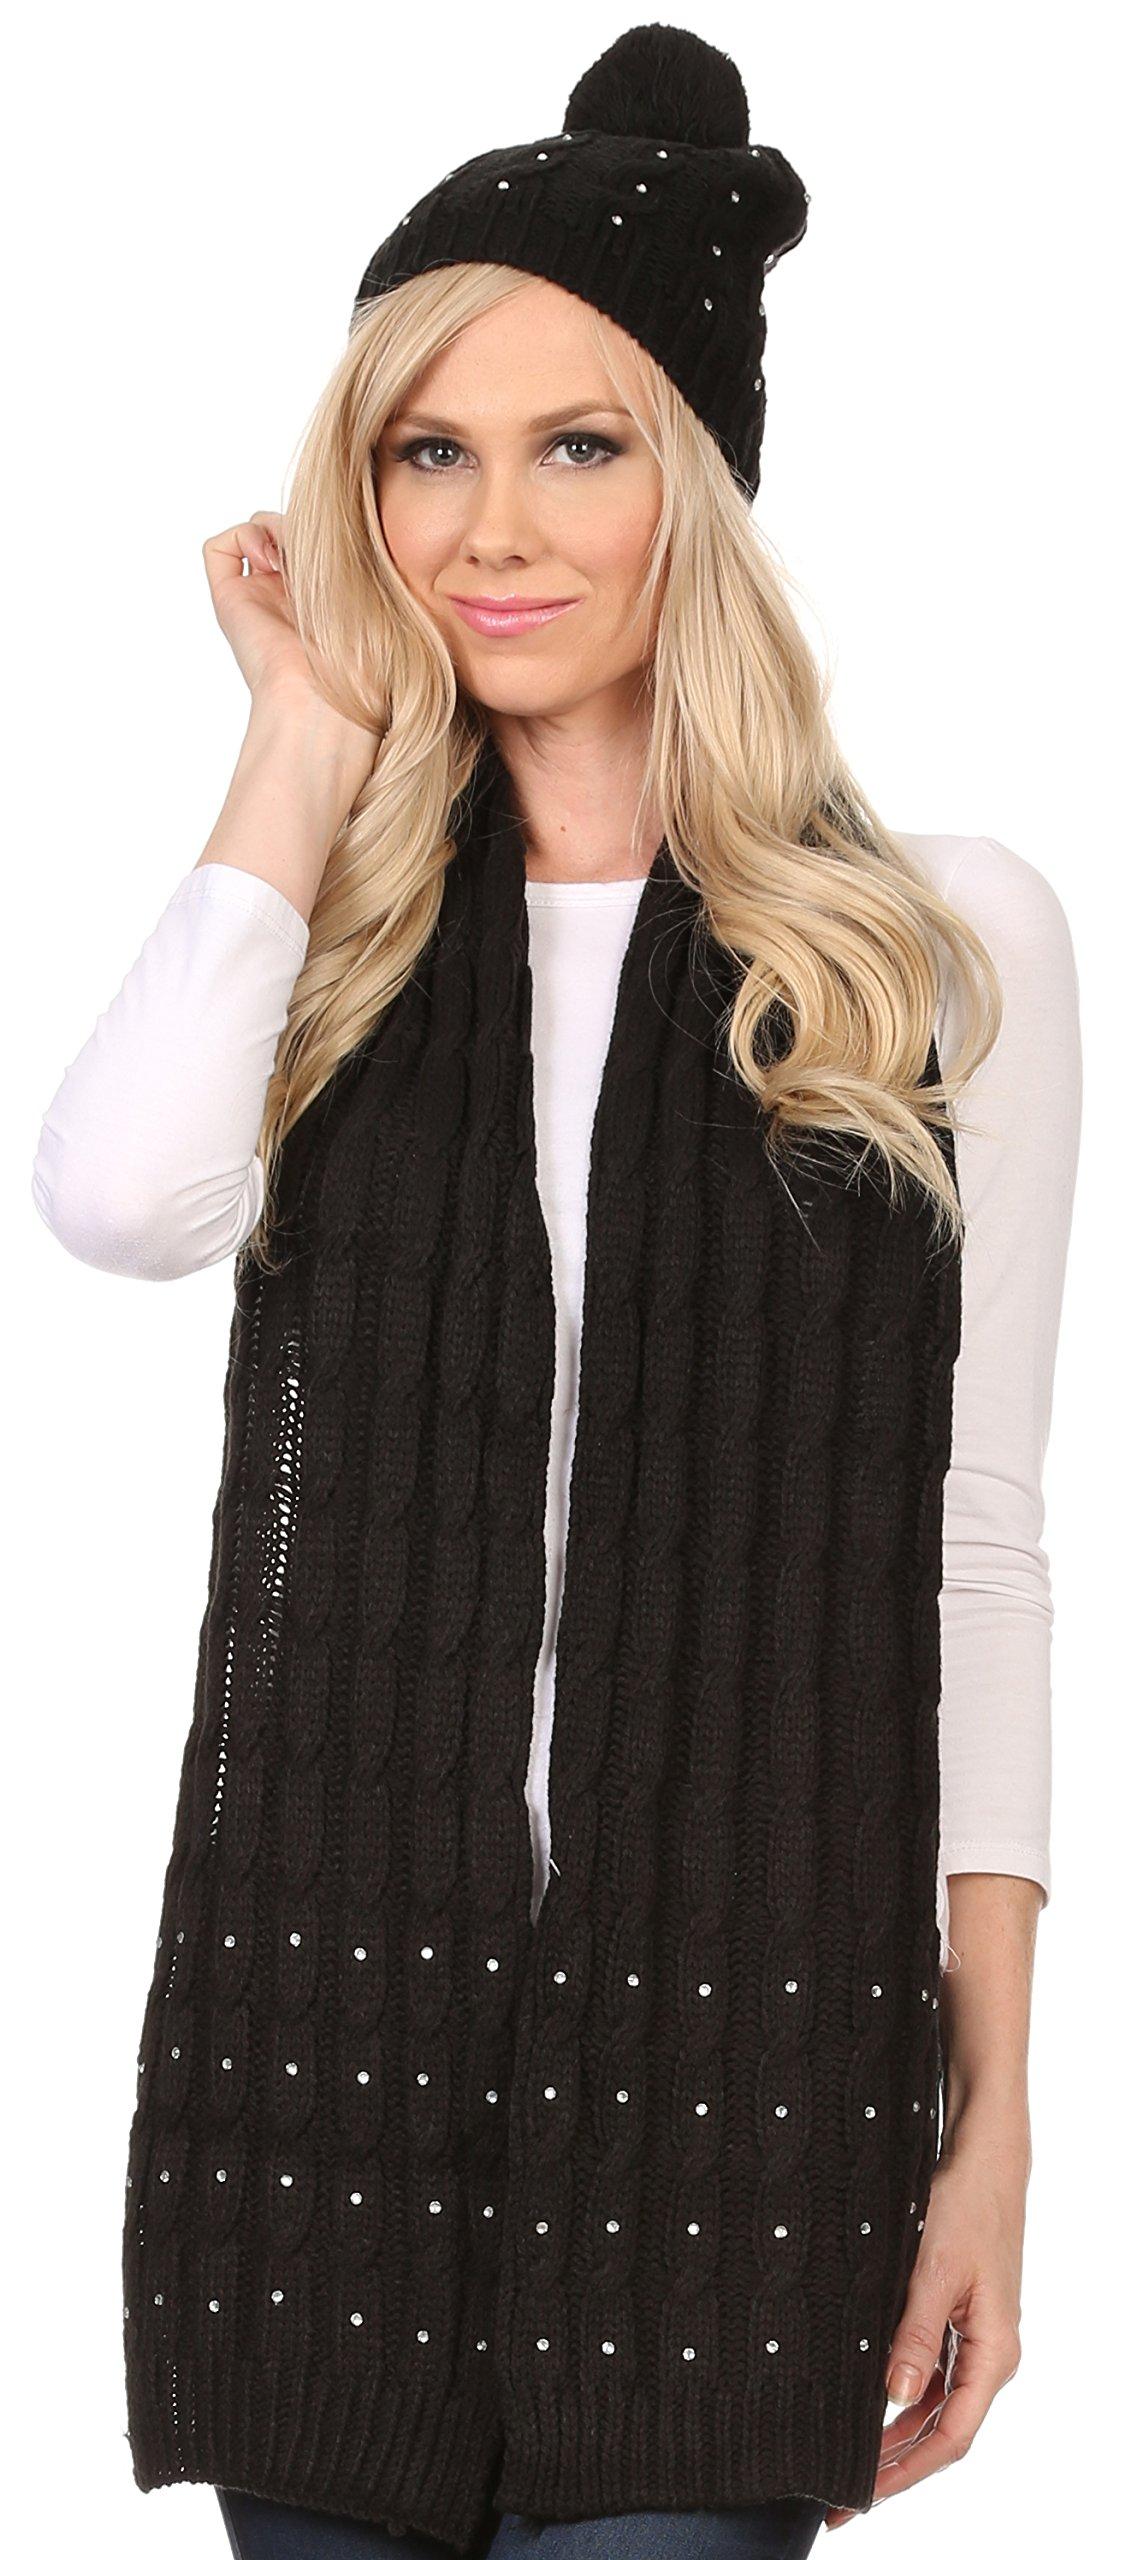 Sakkas CHSS1543 - Kae Jewel Studded Cable Knit Beanie Hat And Scarf Set - Black - OS